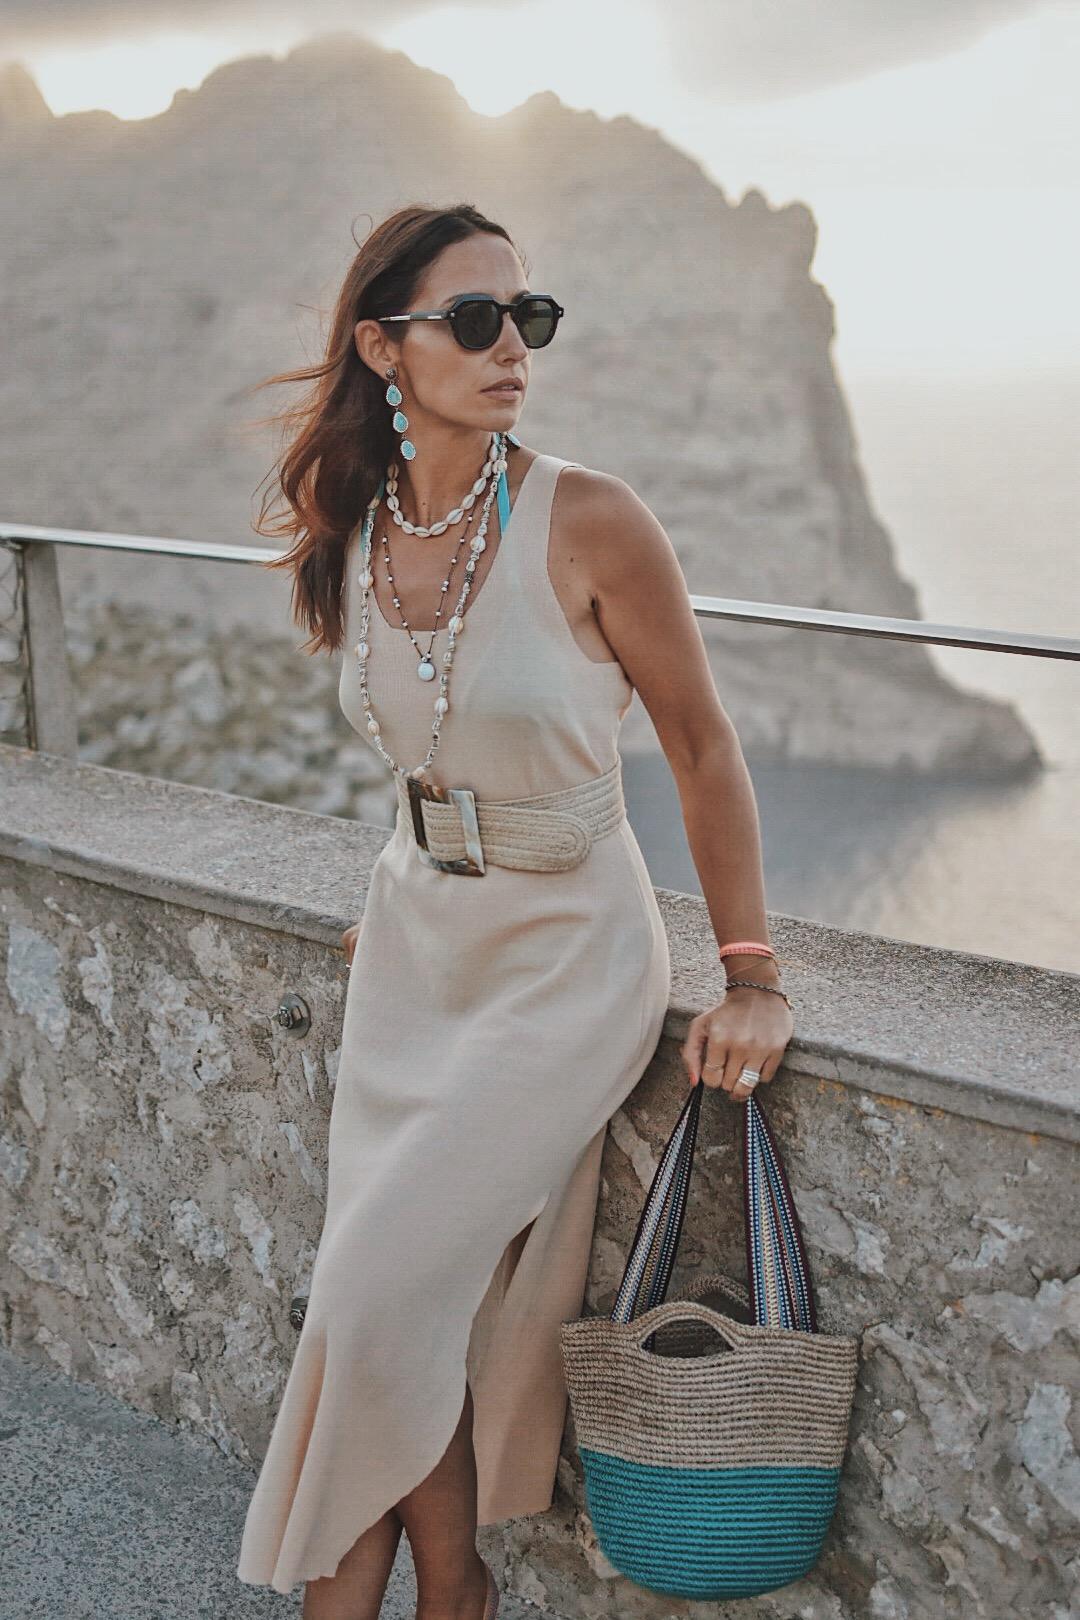 11-el-blog-de-silvia-vestido-beige-mallorca